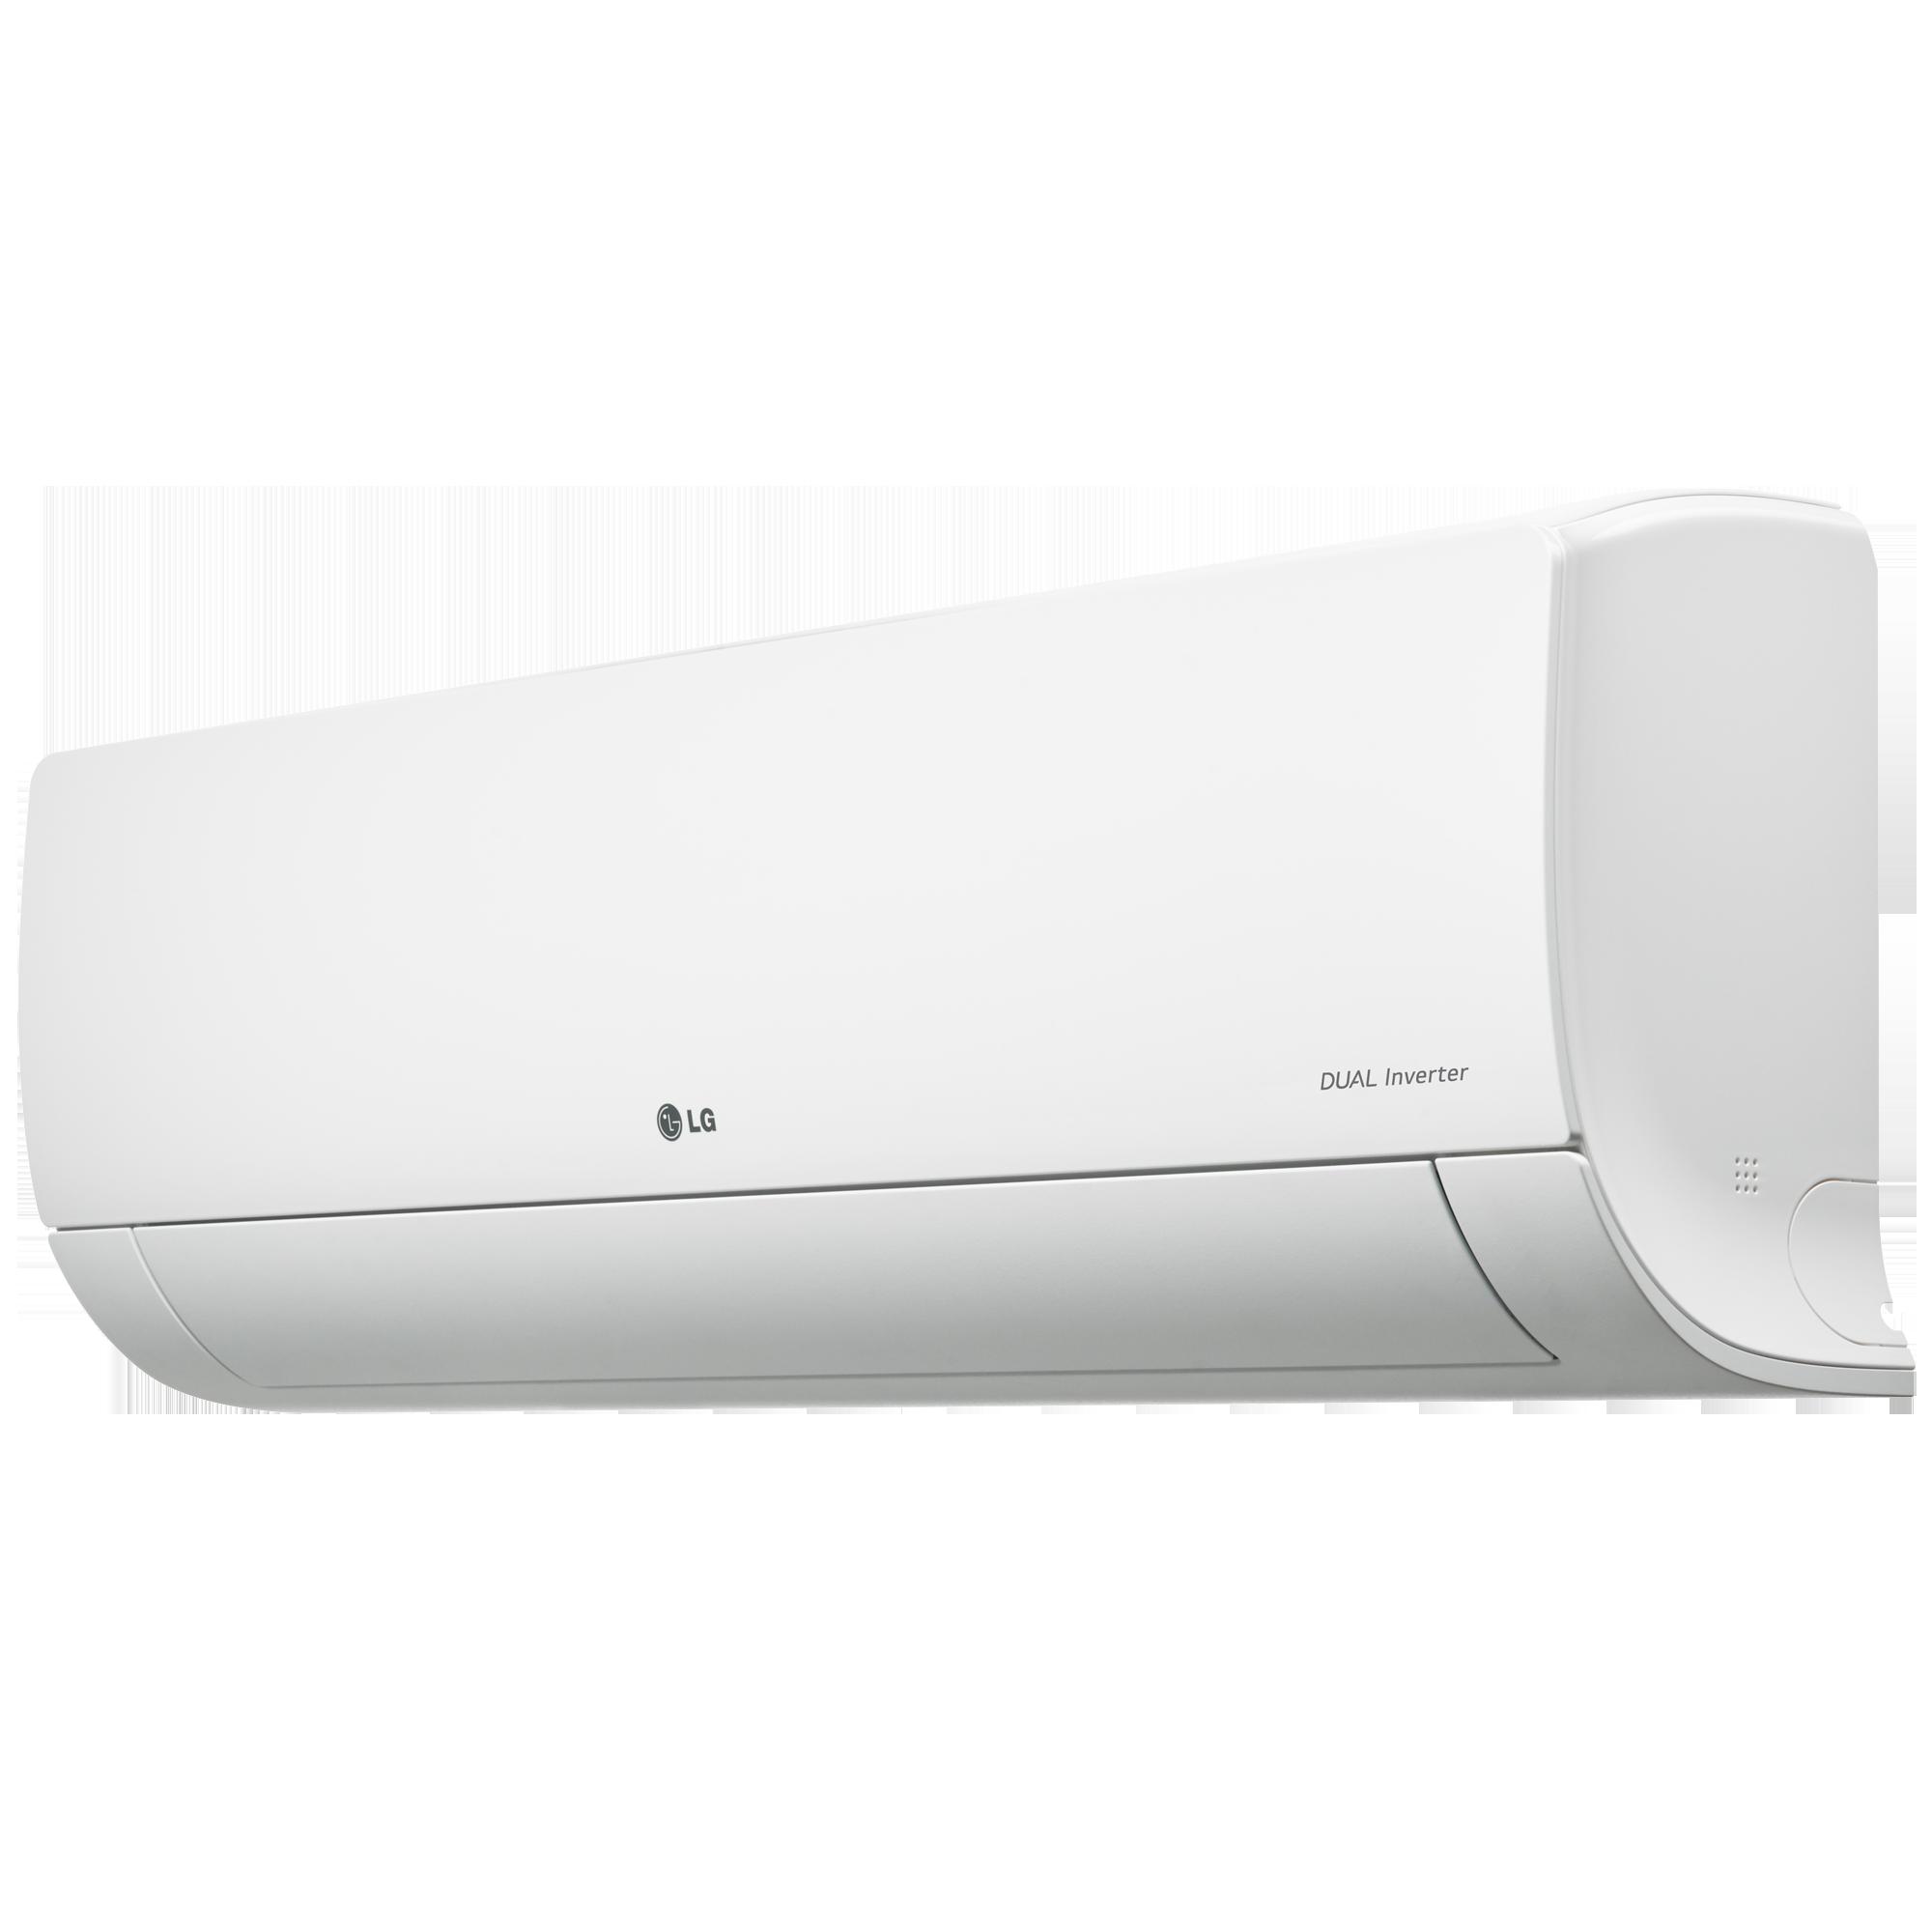 LG 1.5 Ton 5 Star Inverter Split AC (Air Purification Filter, Copper Condenser, MS-Q18ANZA, White)_4